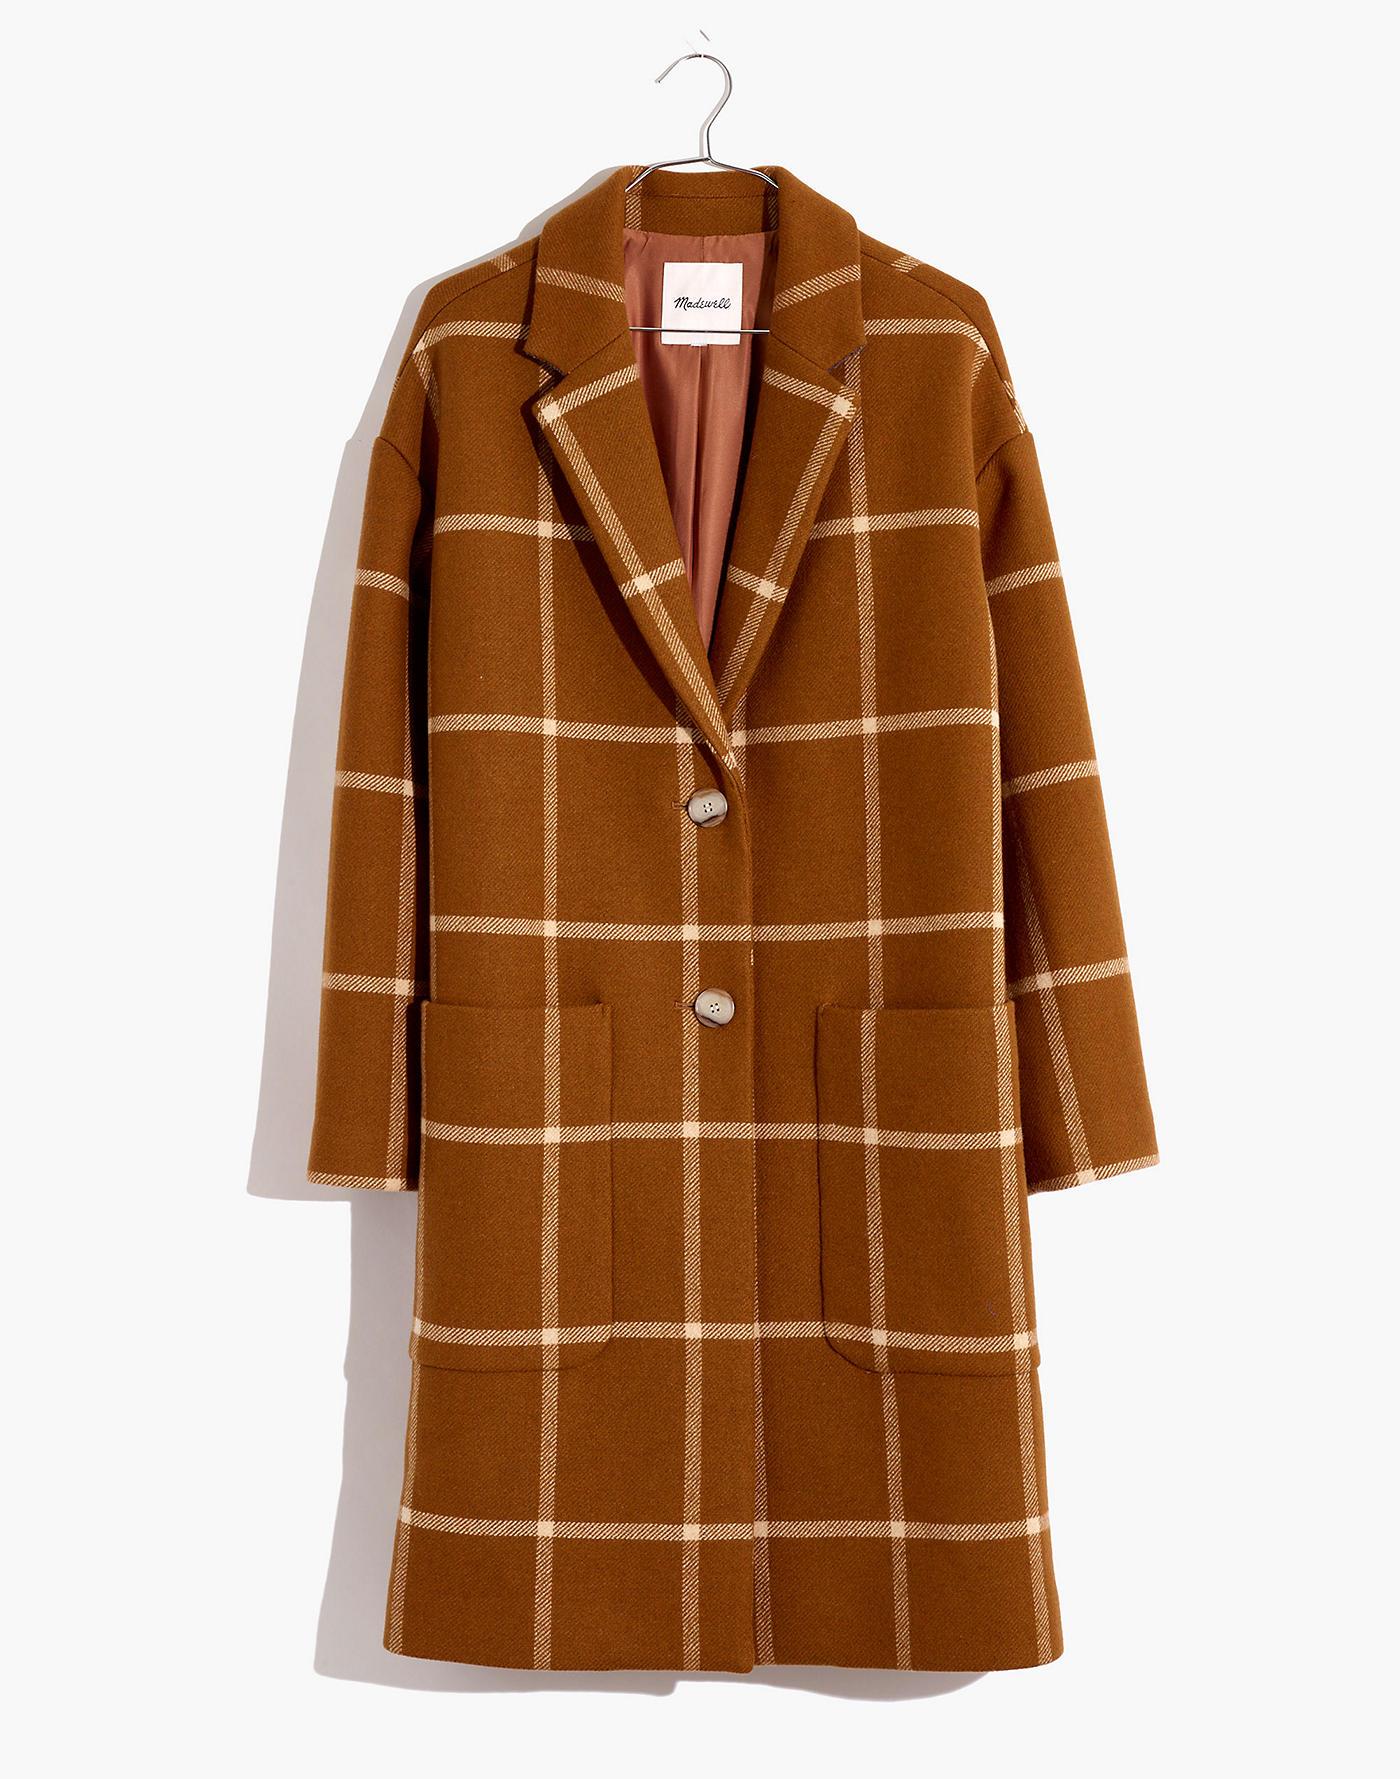 Jacket de Madewell